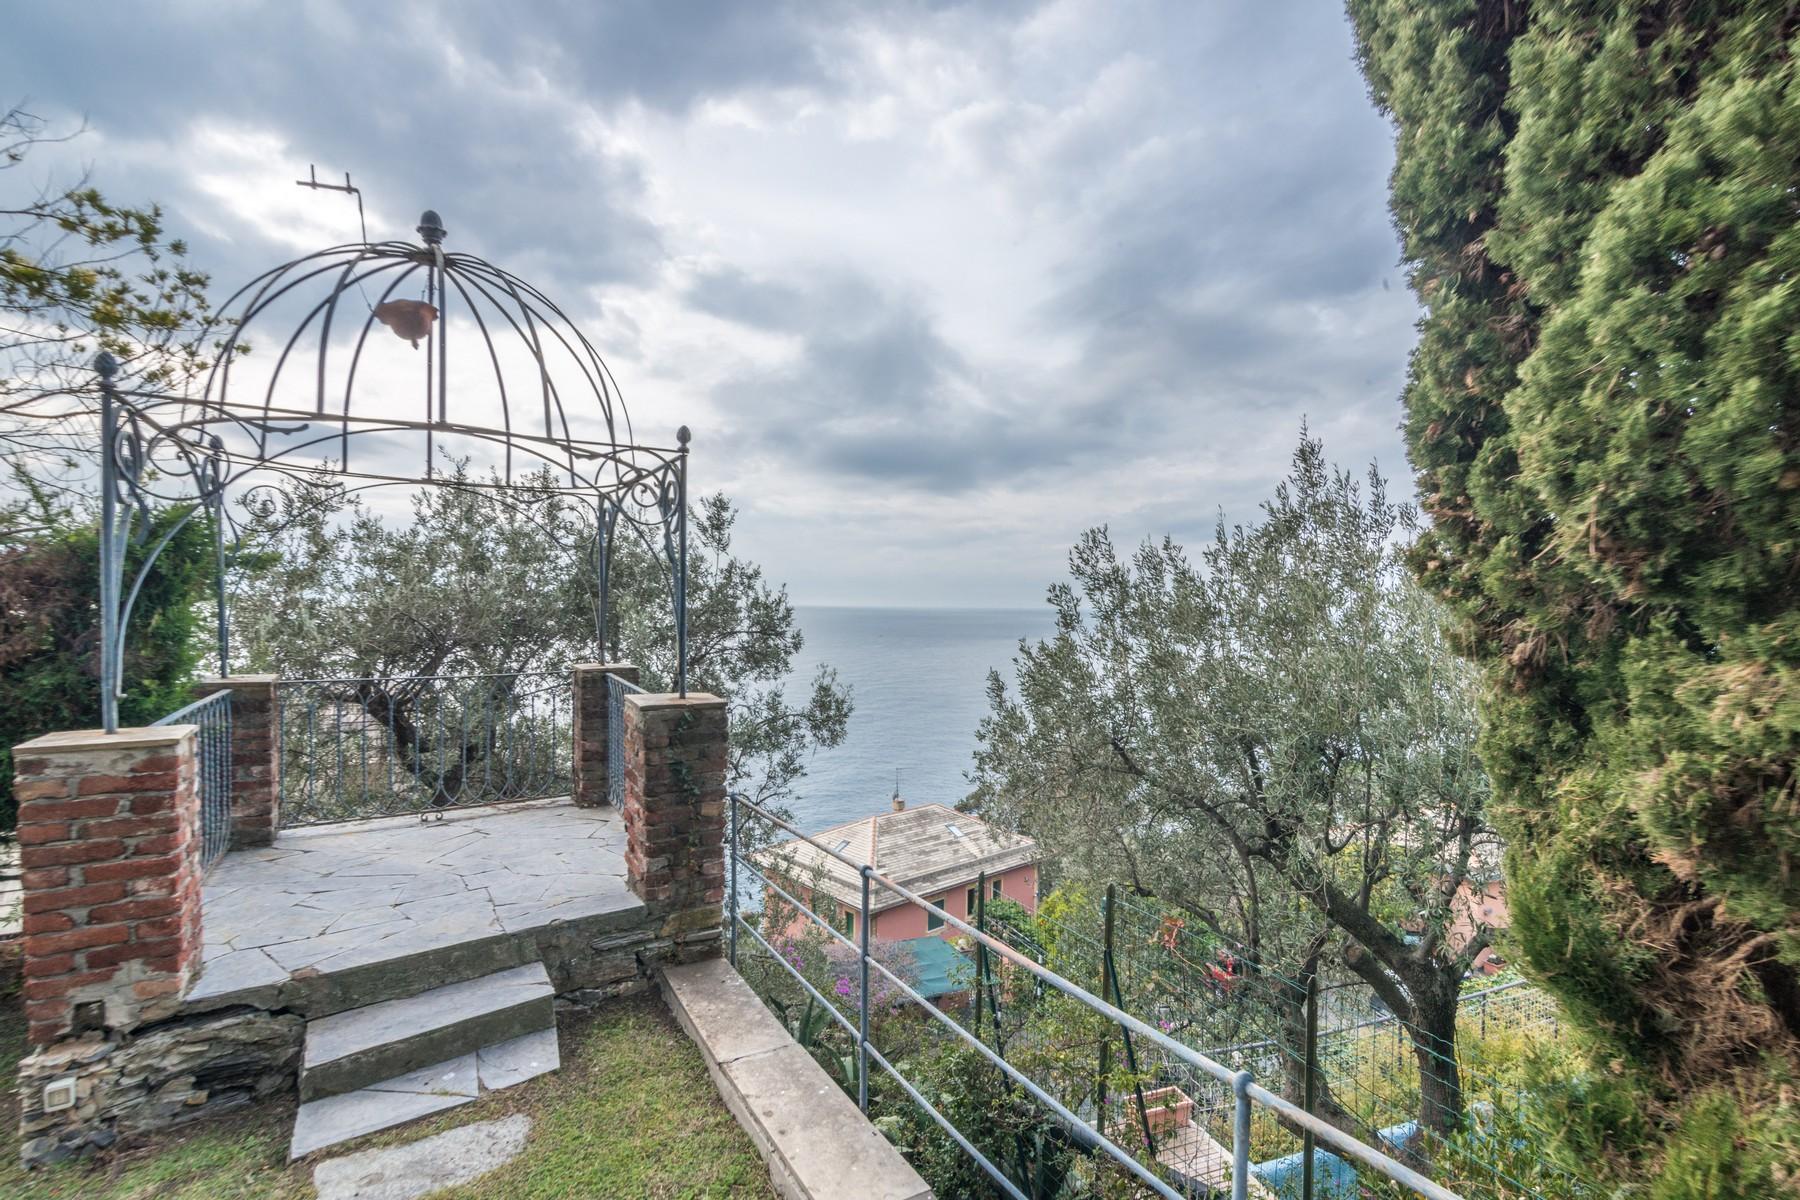 Villa in Vendita a Sori: 5 locali, 720 mq - Foto 4